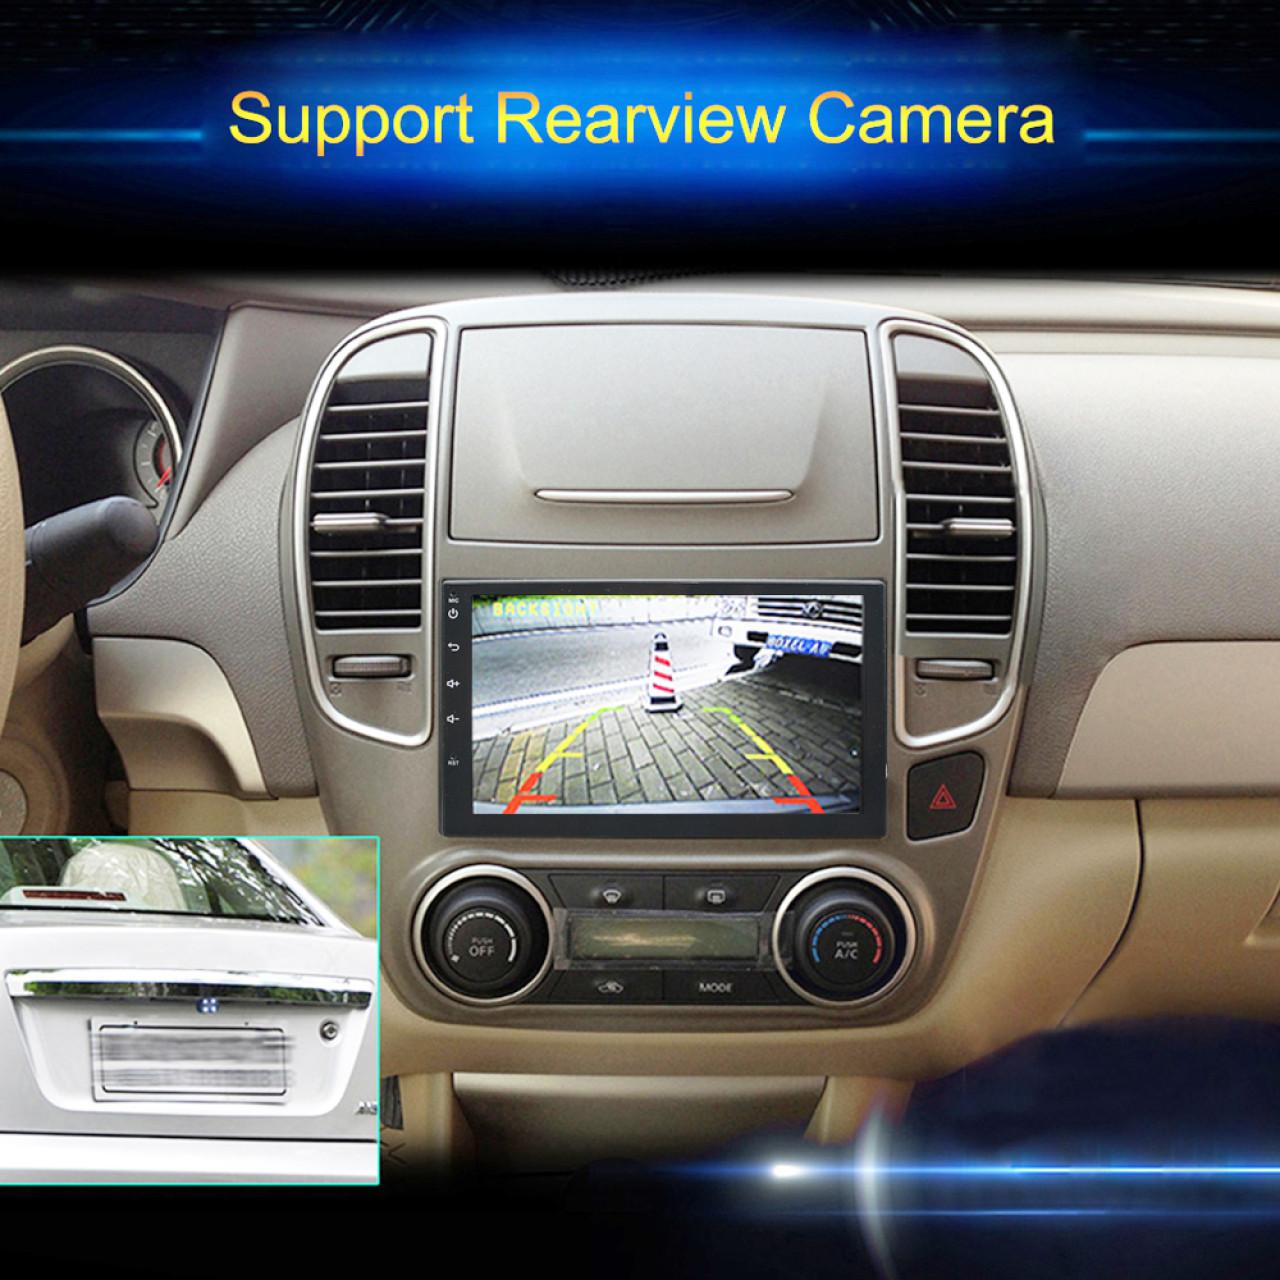 NAVIGATIE CARPAD ANDROID DEDICATA VW GOLF IV  ECRAN 7'' USB INTERNET 3G GPS WAZE COMENZI VOLAN